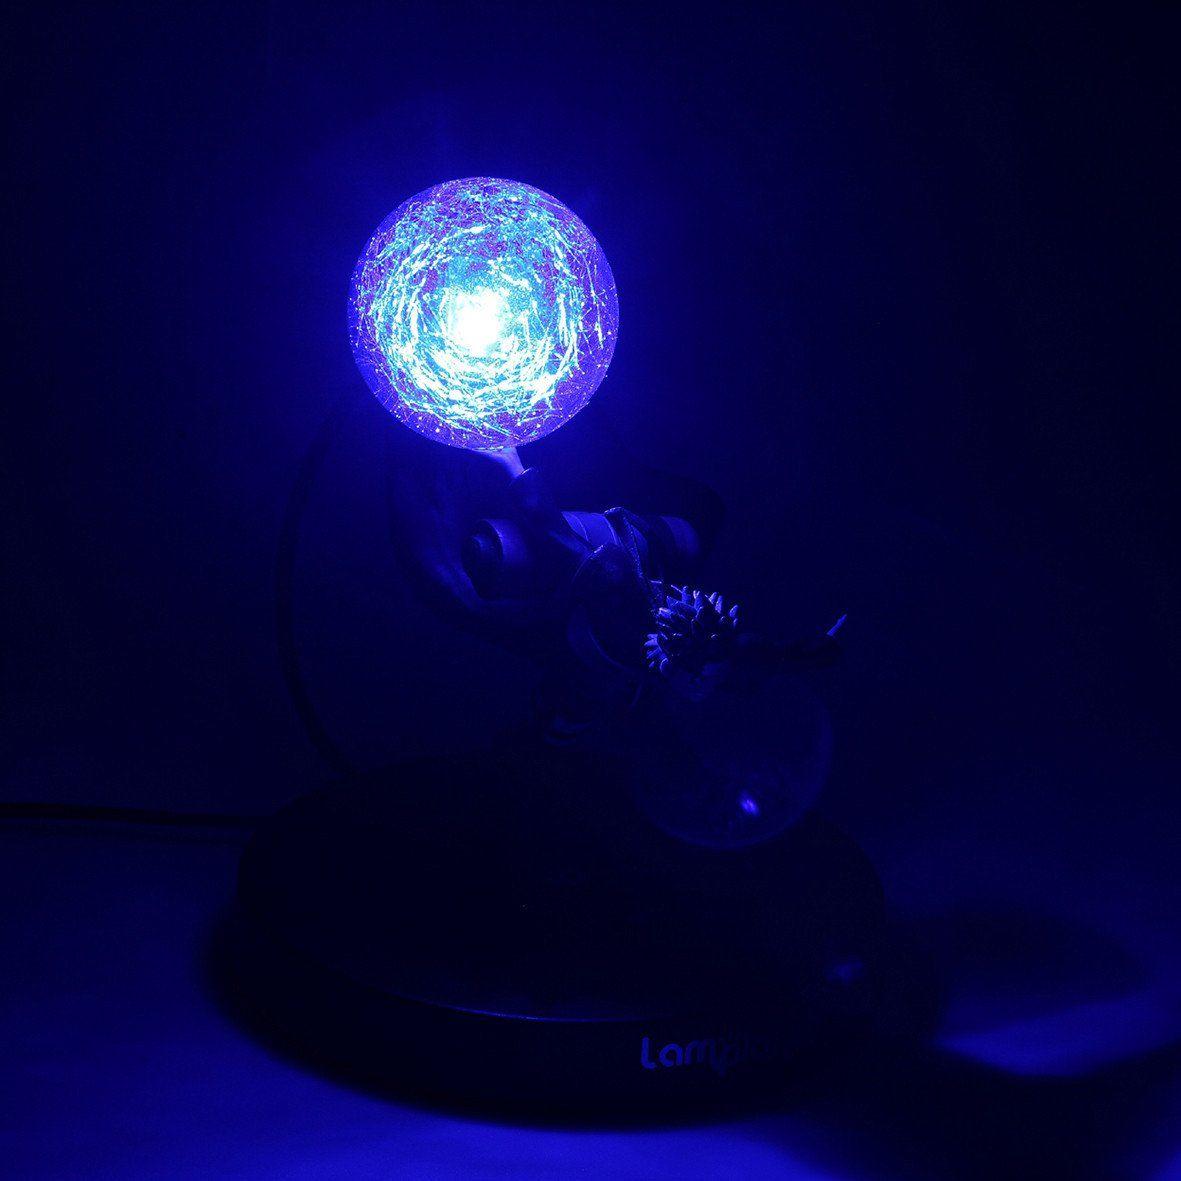 Oodama Rasengan Lamp · The One & Only | Lamplanet | Lamp ...